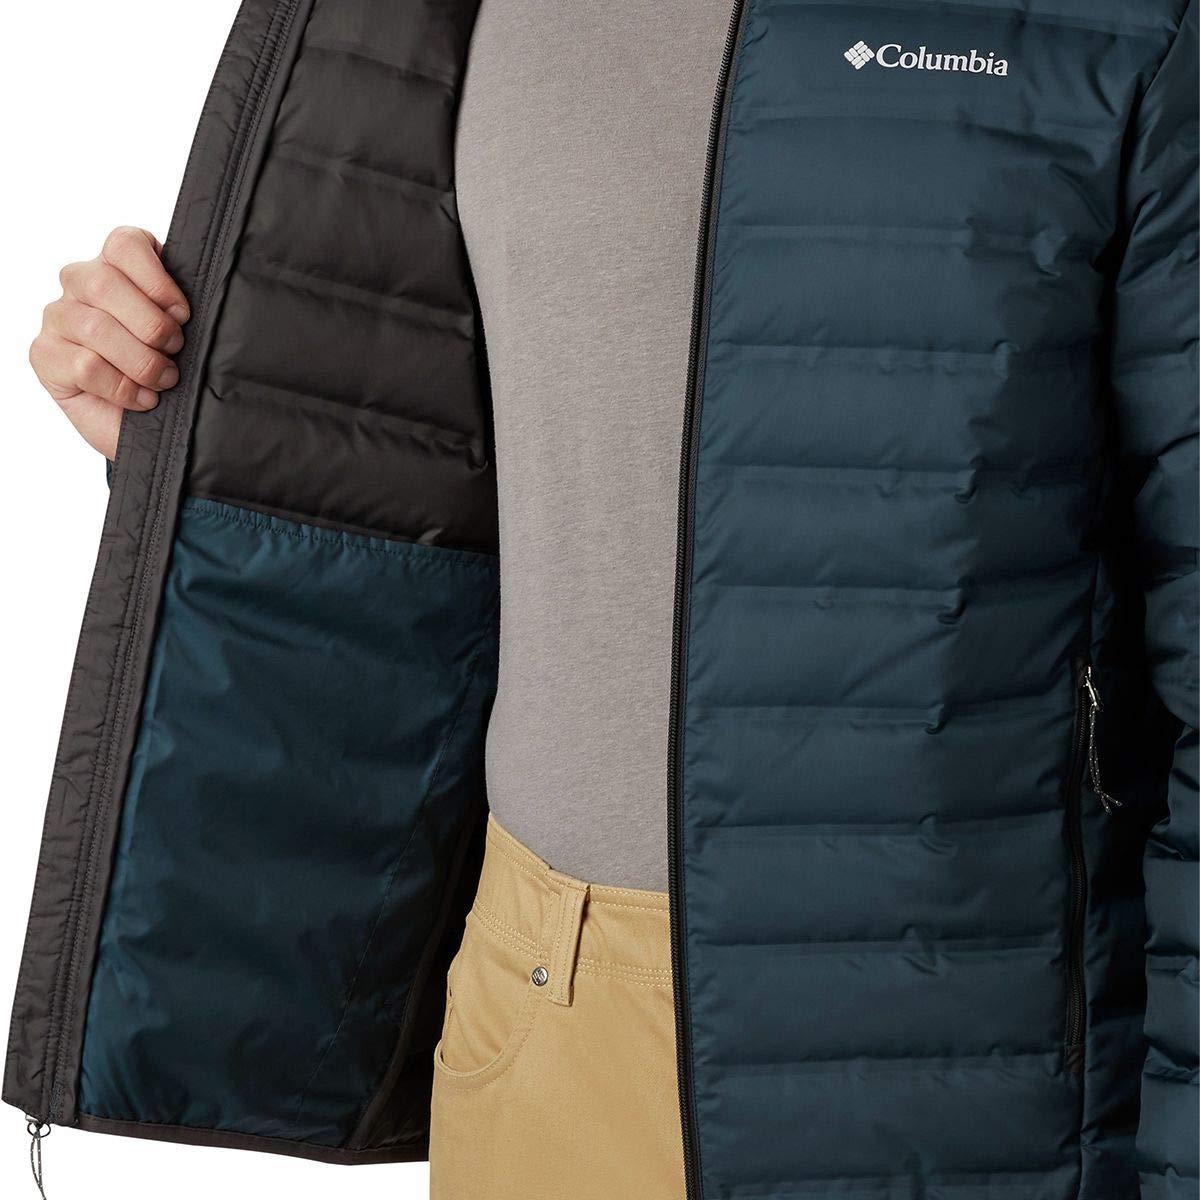 Mens Columbia Lake 22 Down Jacket Shirts Clothing prb.org.af